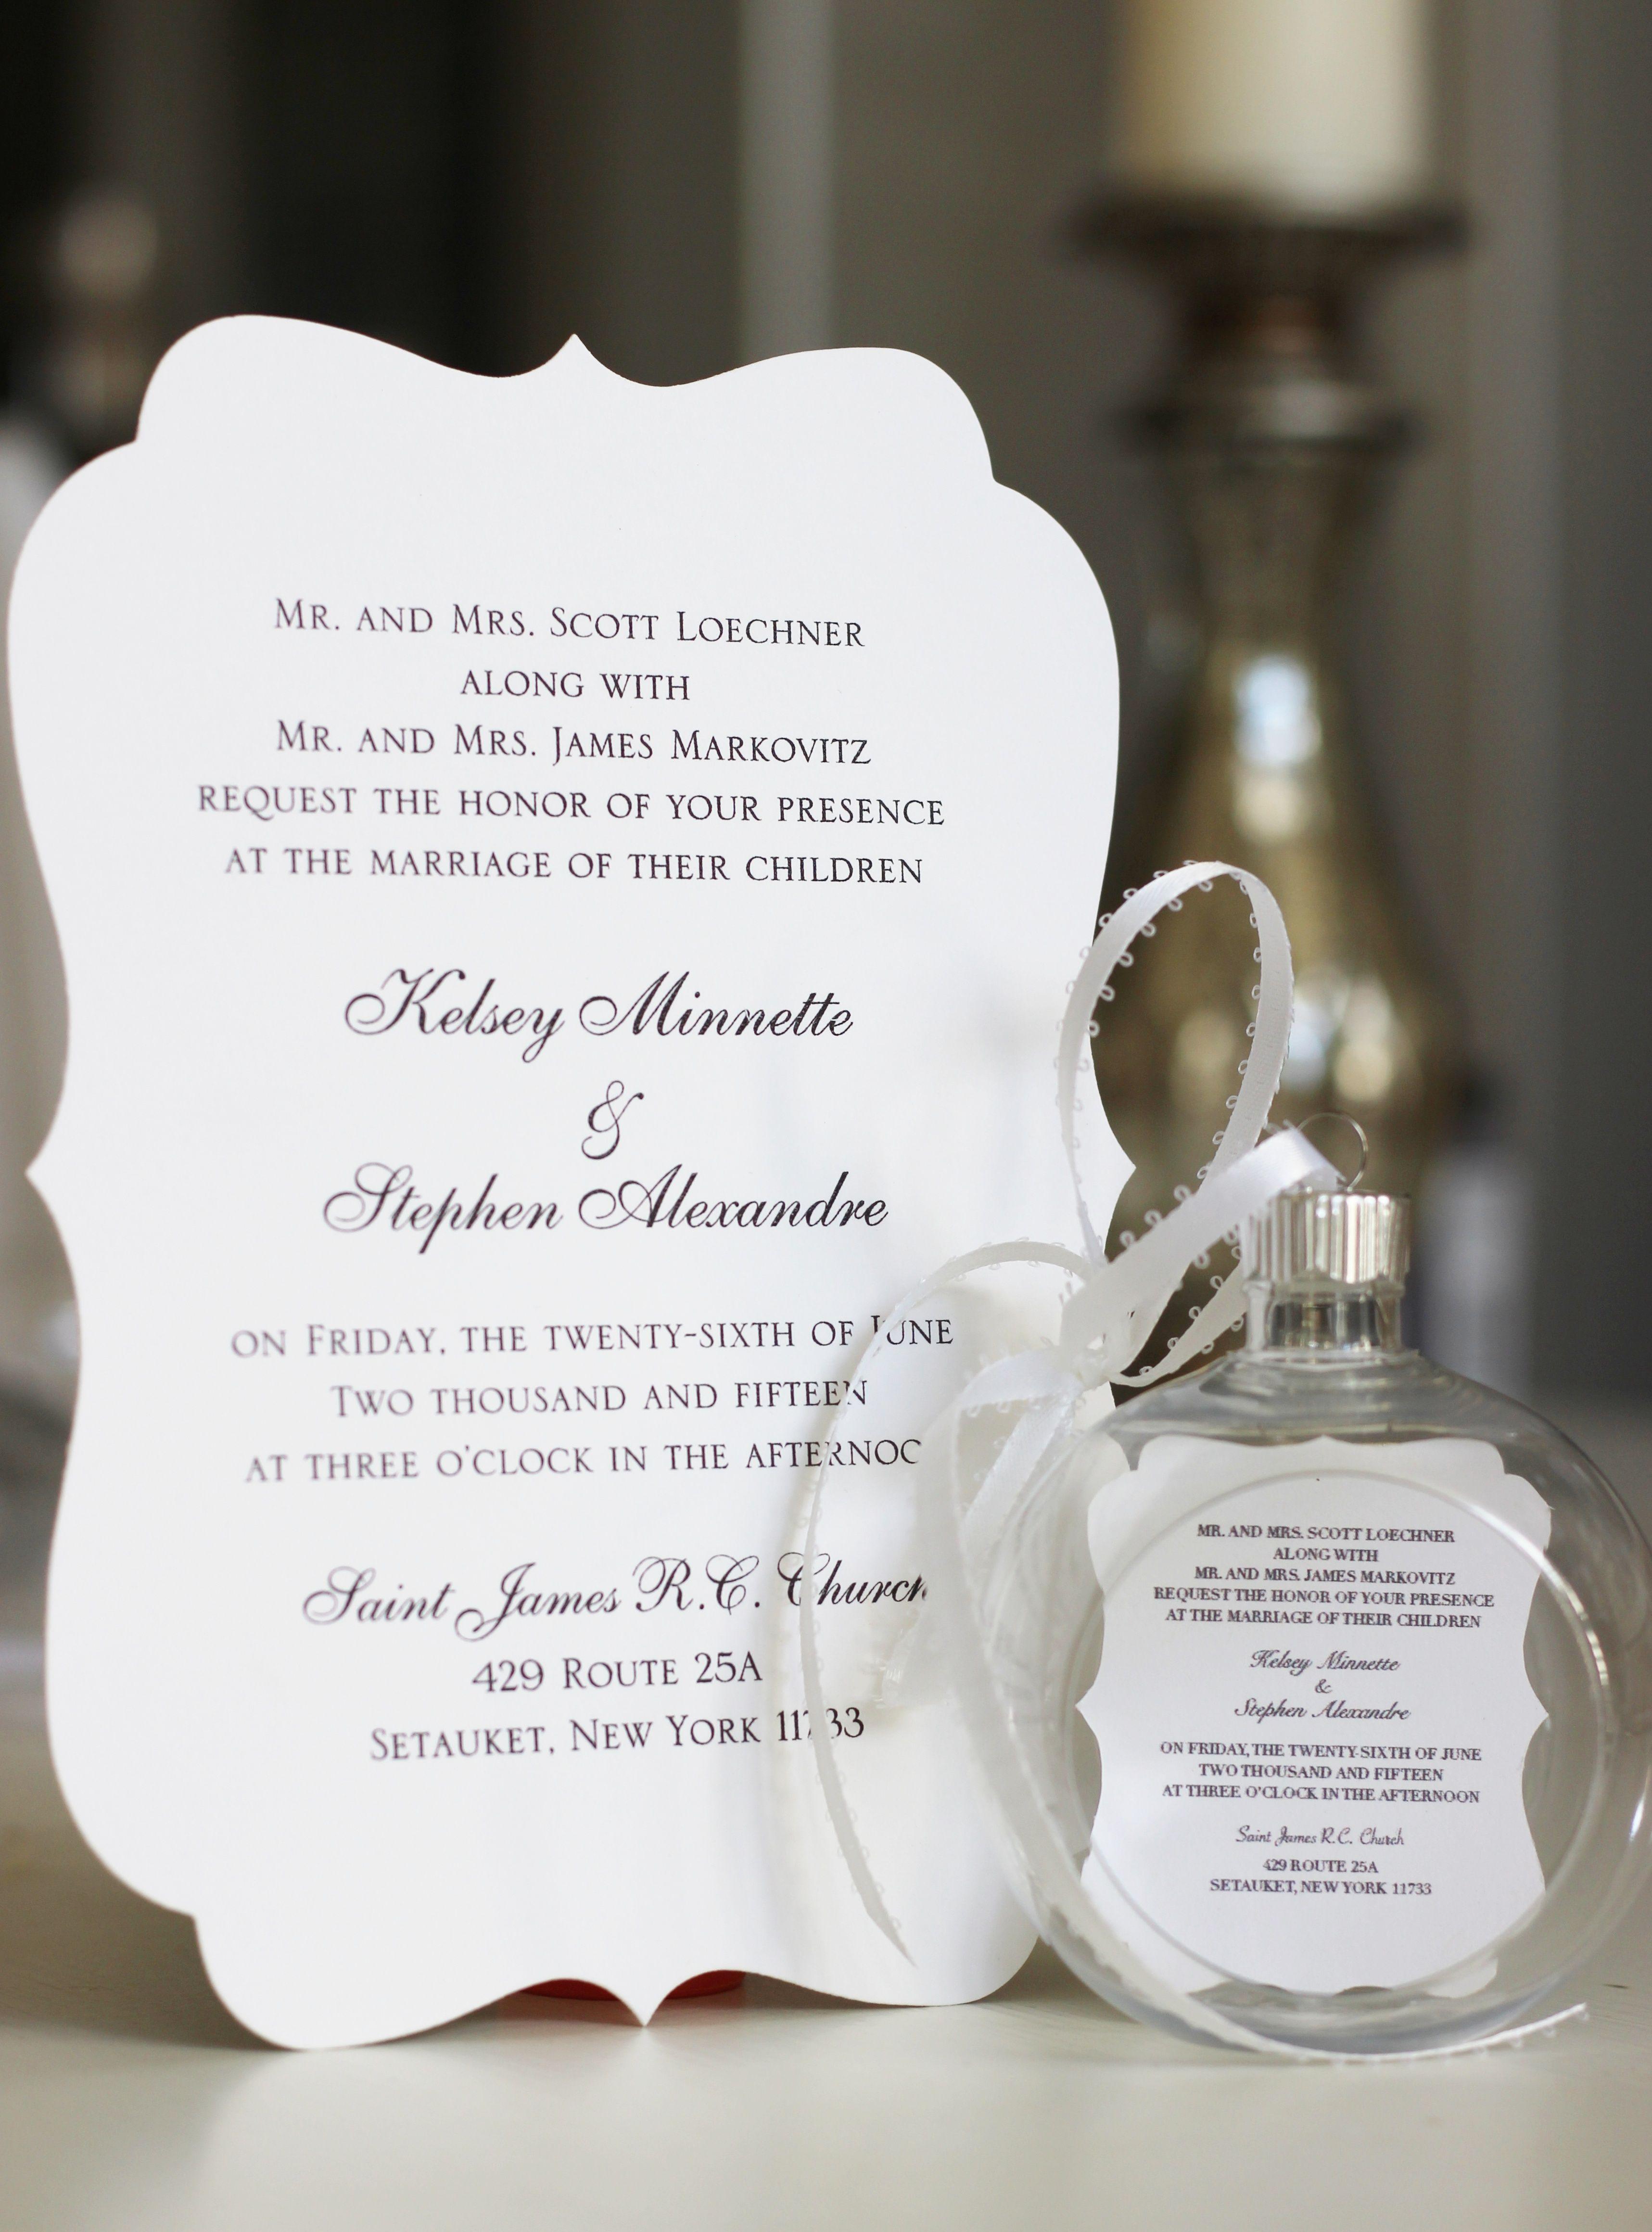 Pin by Cali Coast Wine Country: Liz Dodder on Wedding Ideas ...